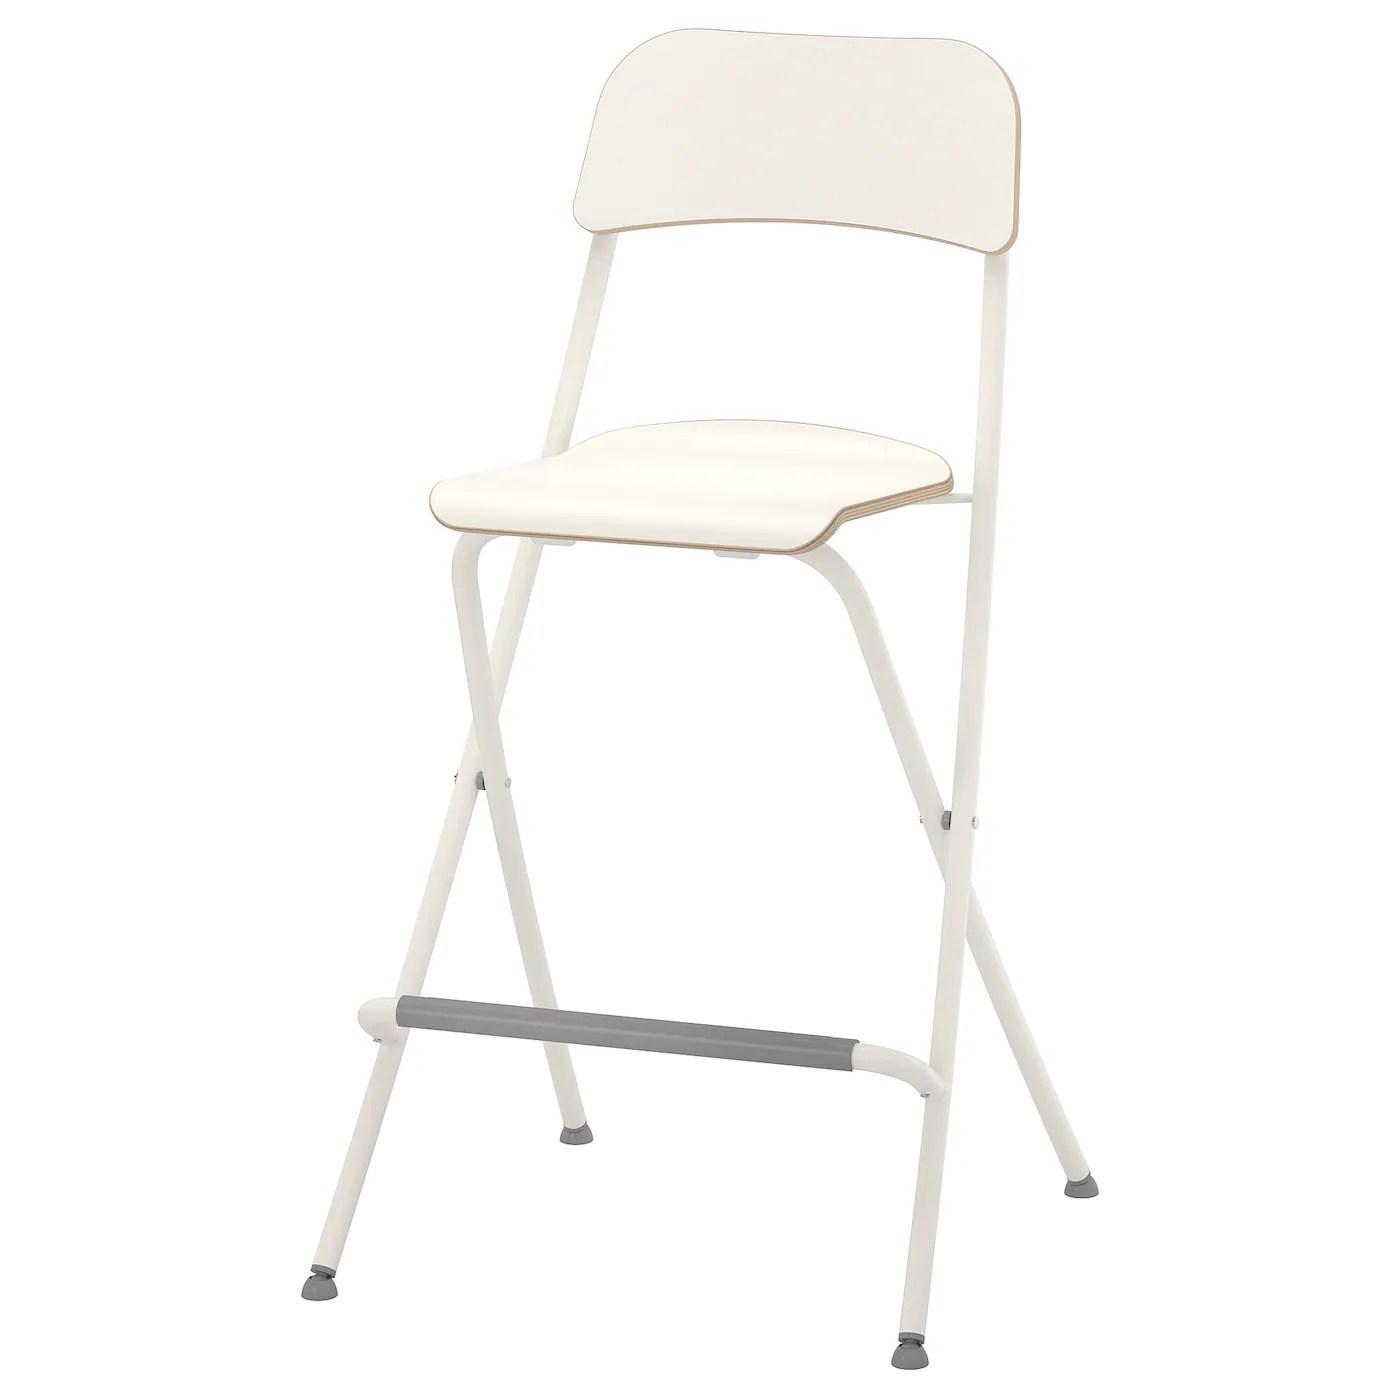 Franklin Chaise De Bar Pliante Blanc Blanc 63 Cm Ikea